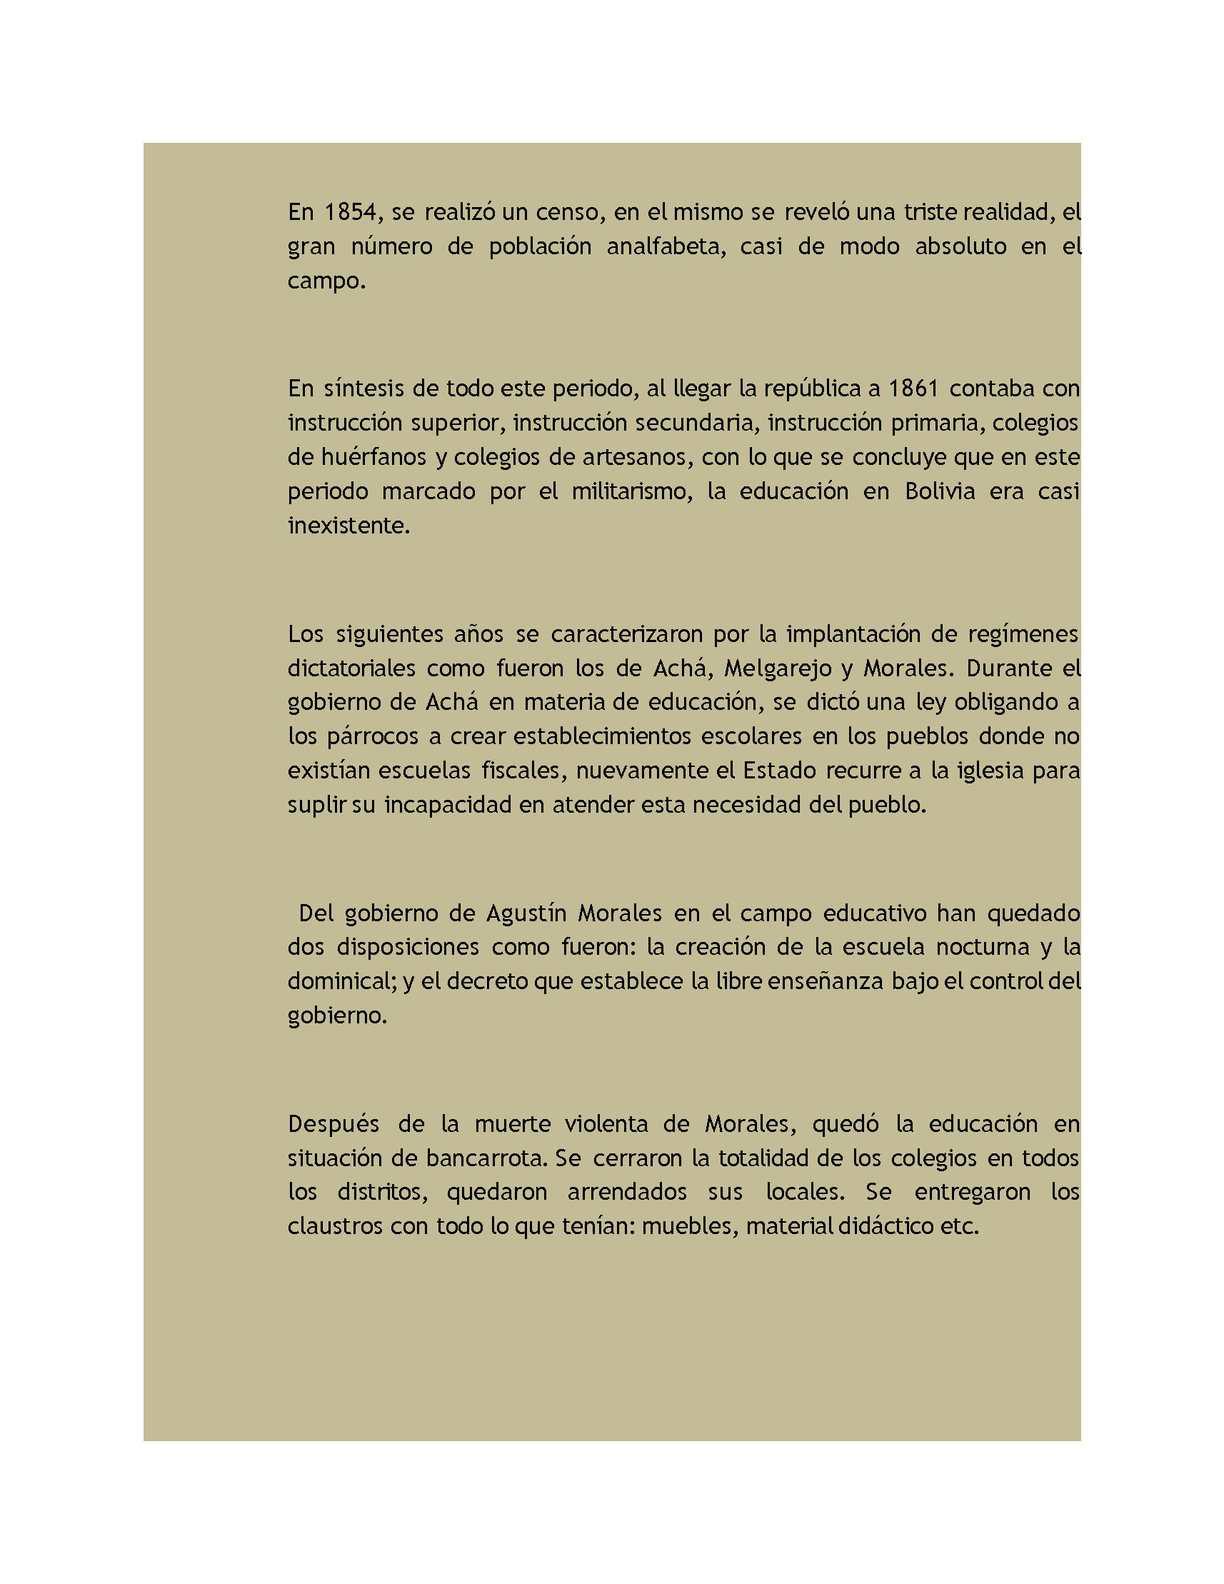 Historia De La Educaci N En Bolivia Calameo Downloader # Muebles Morales